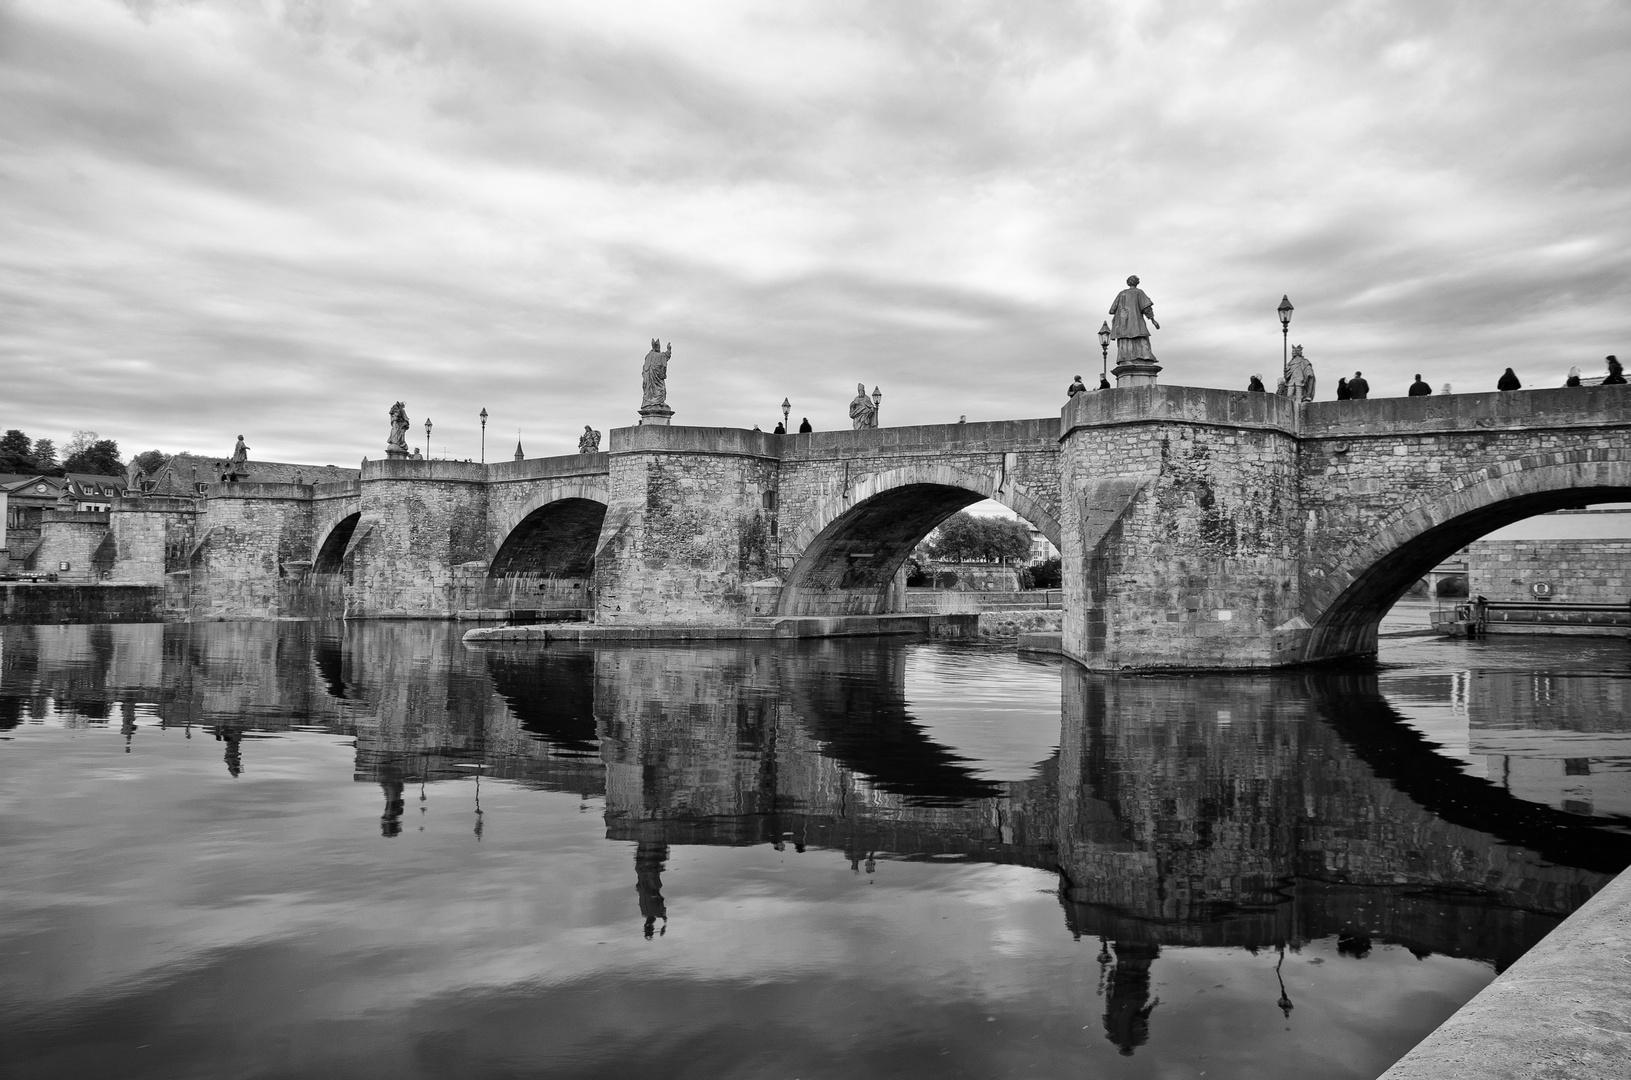 Brücke in Würzburg